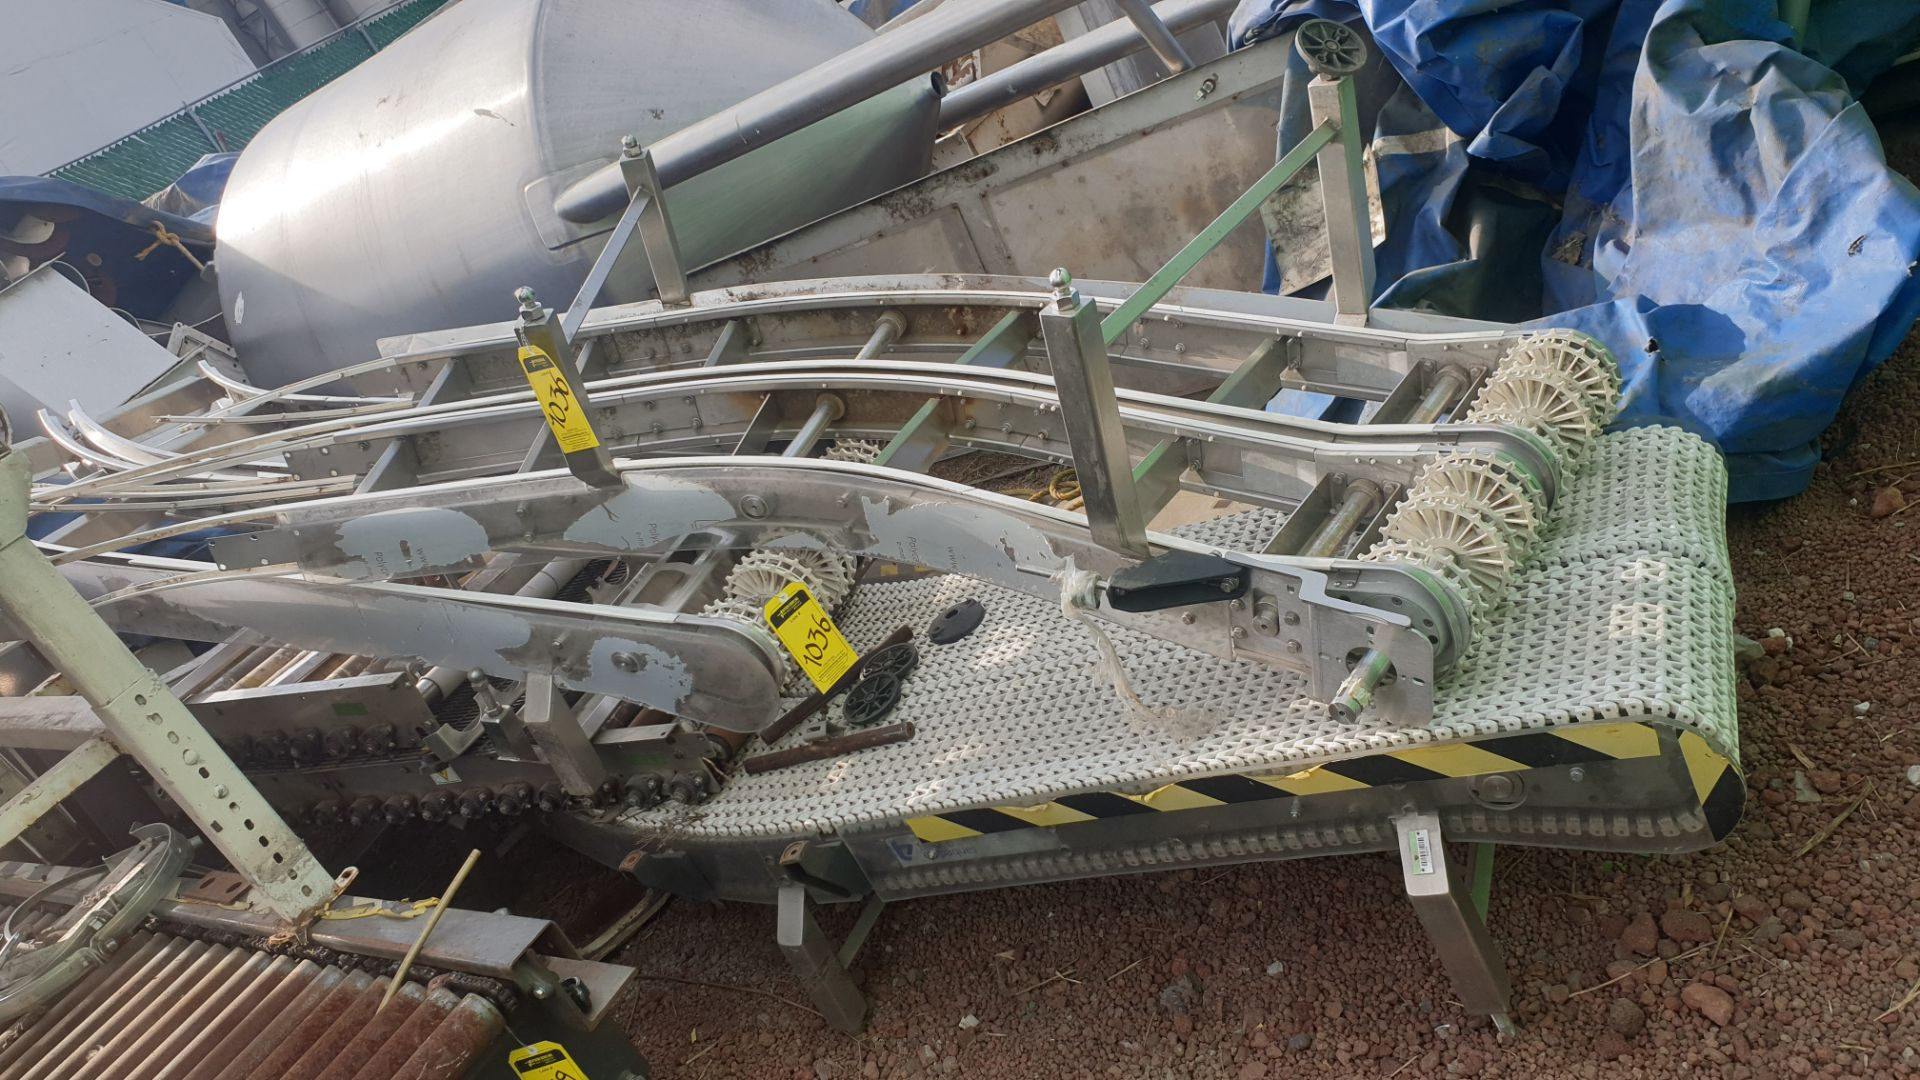 S conveyor belt batch. Please inspect - Image 8 of 9